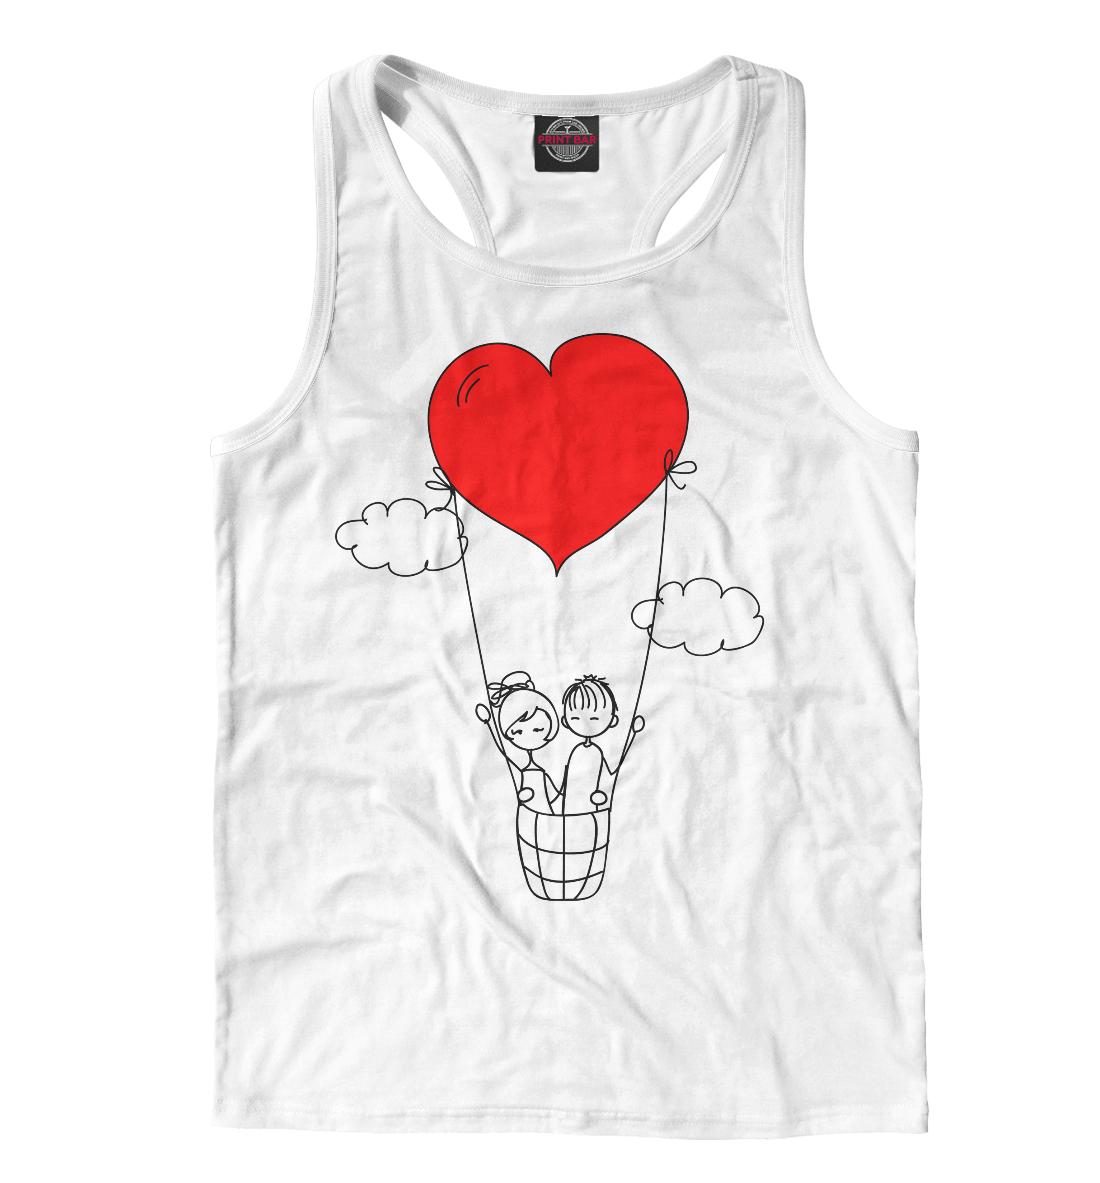 Купить Человечки и сердечки, Printbar, Майки борцовки, 14F-778657-mayb-2